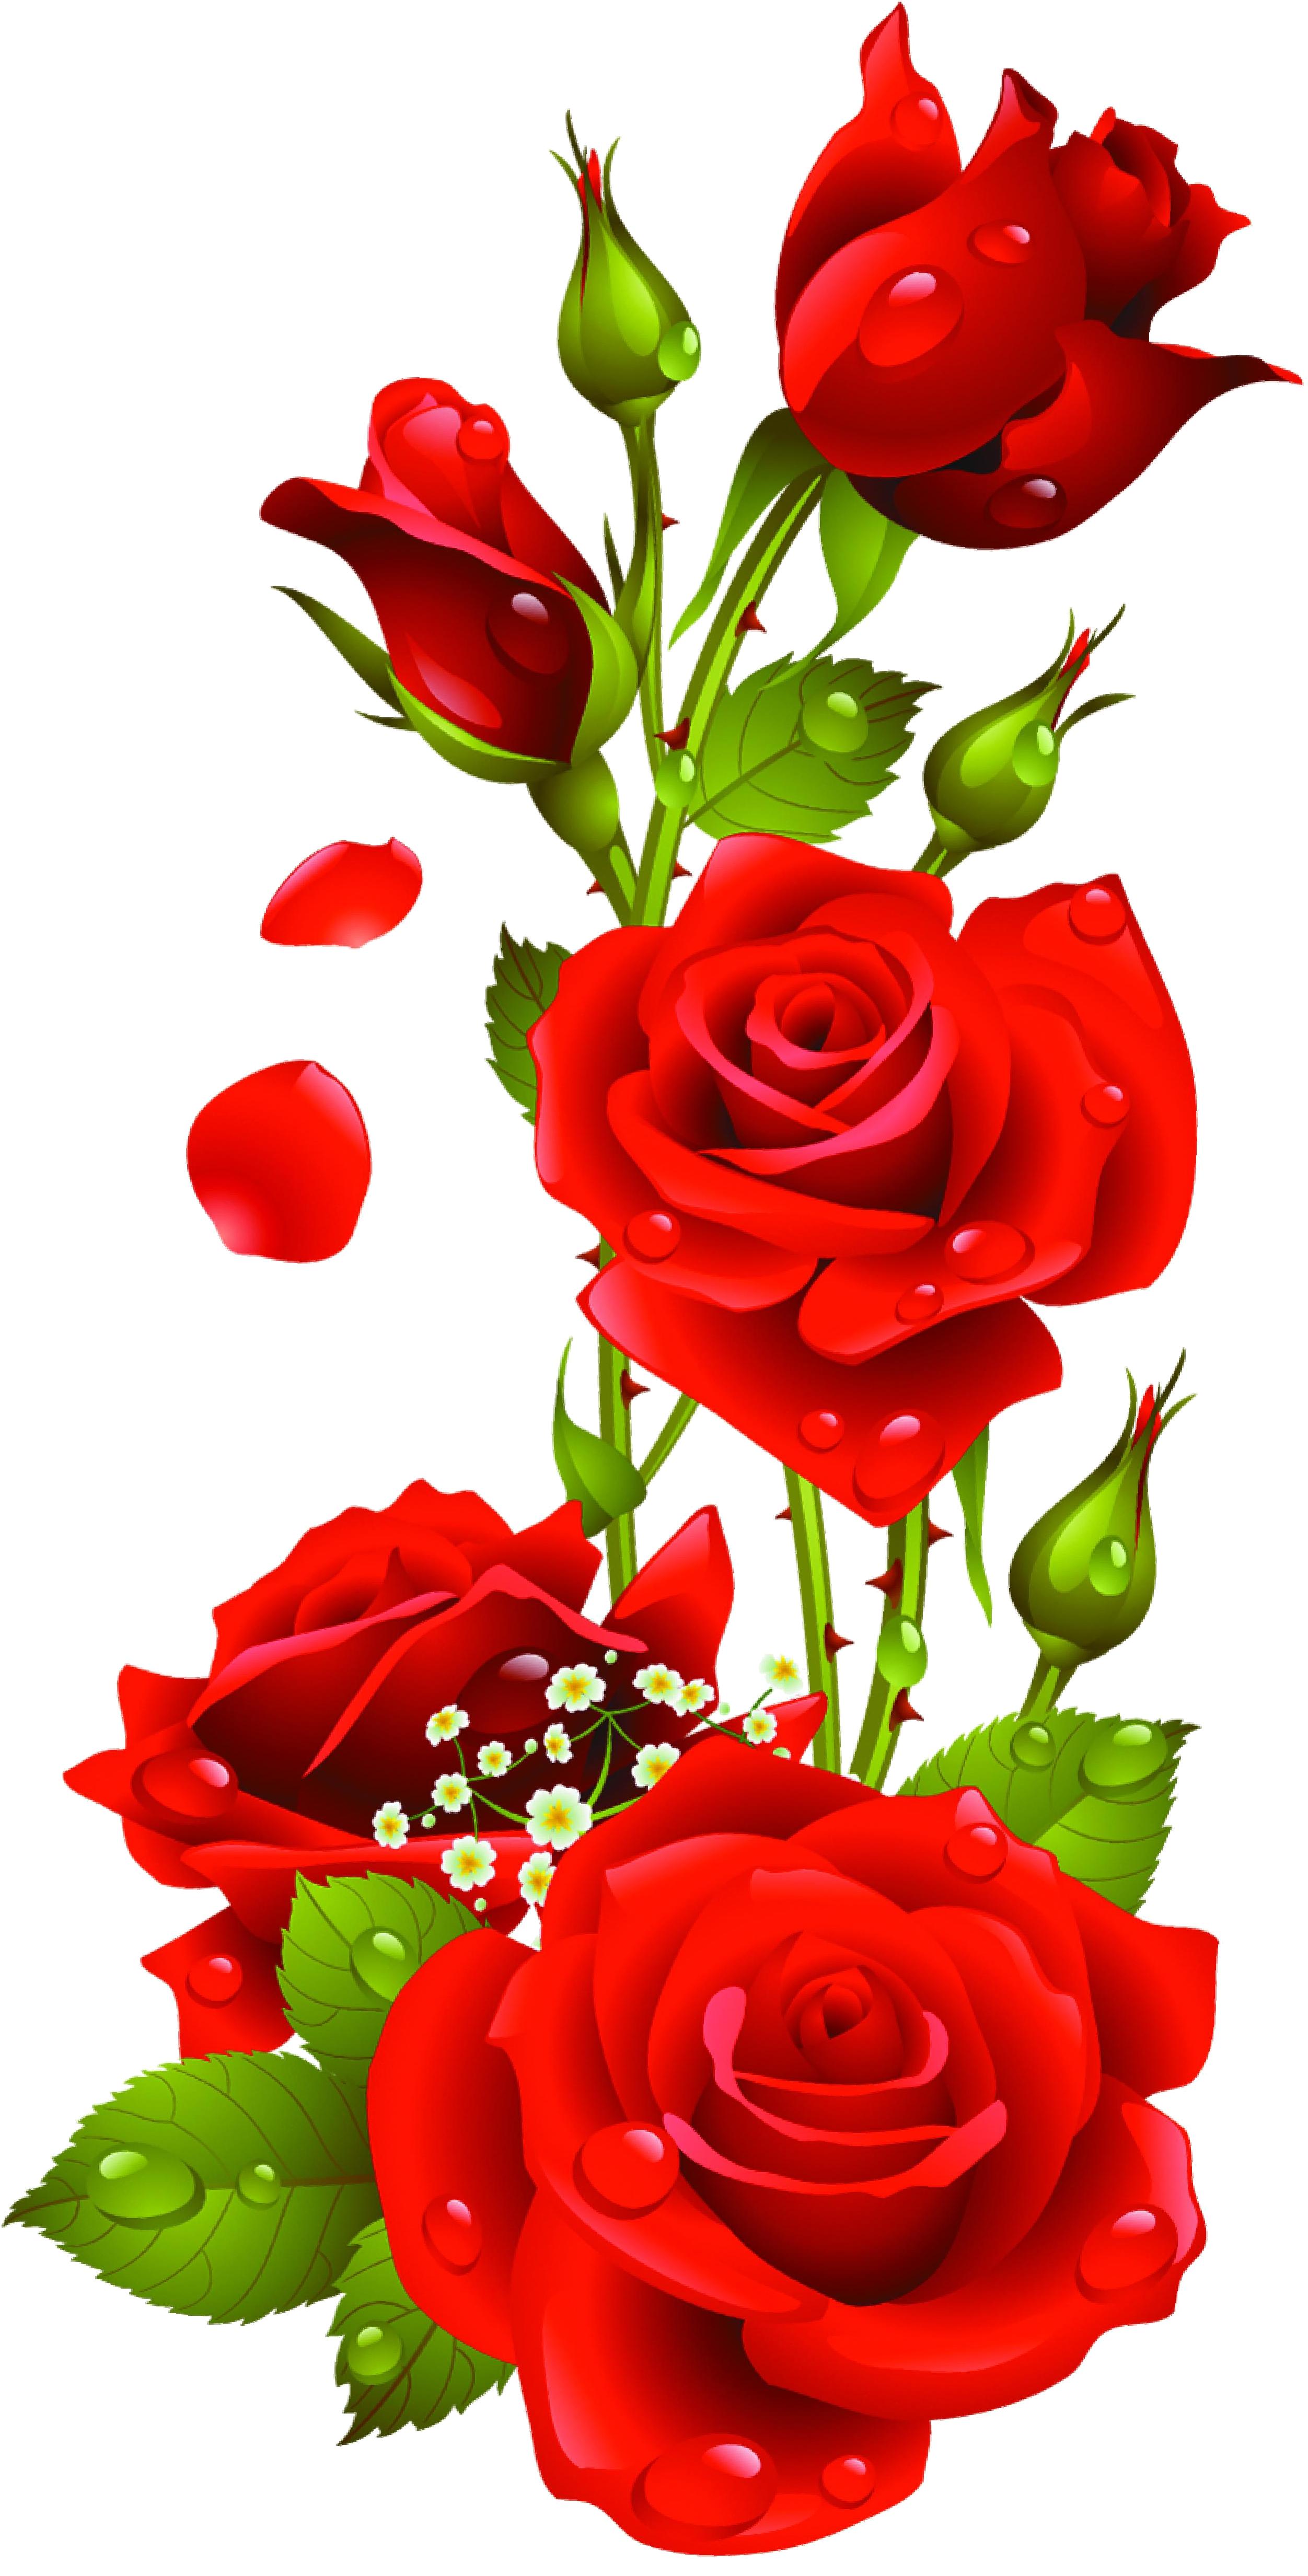 Red Roses Vector, Kyrmyzy gul png resimler, png kyrmyzy gul.